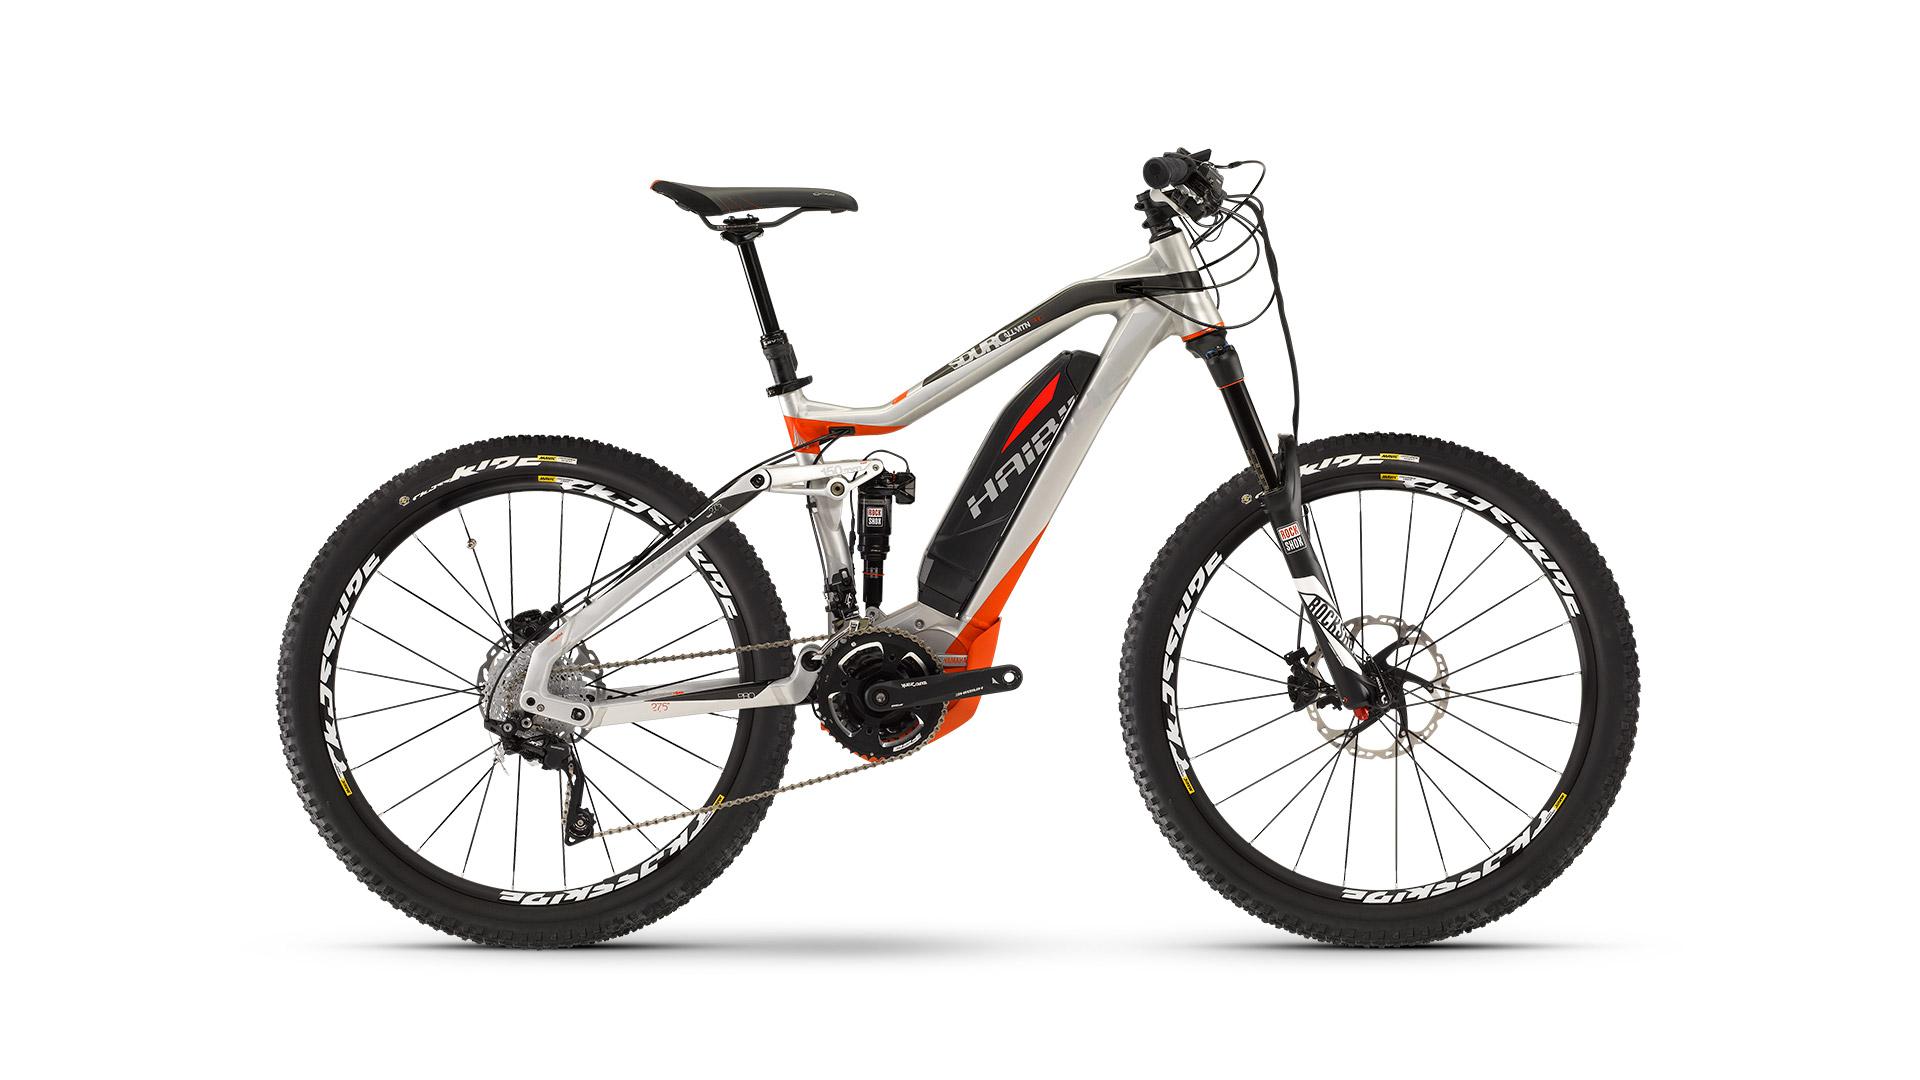 Xduro 2016 16z 5mm OS Painted F Plus Bikes Sz Haibike Drive Pinion E-bike F